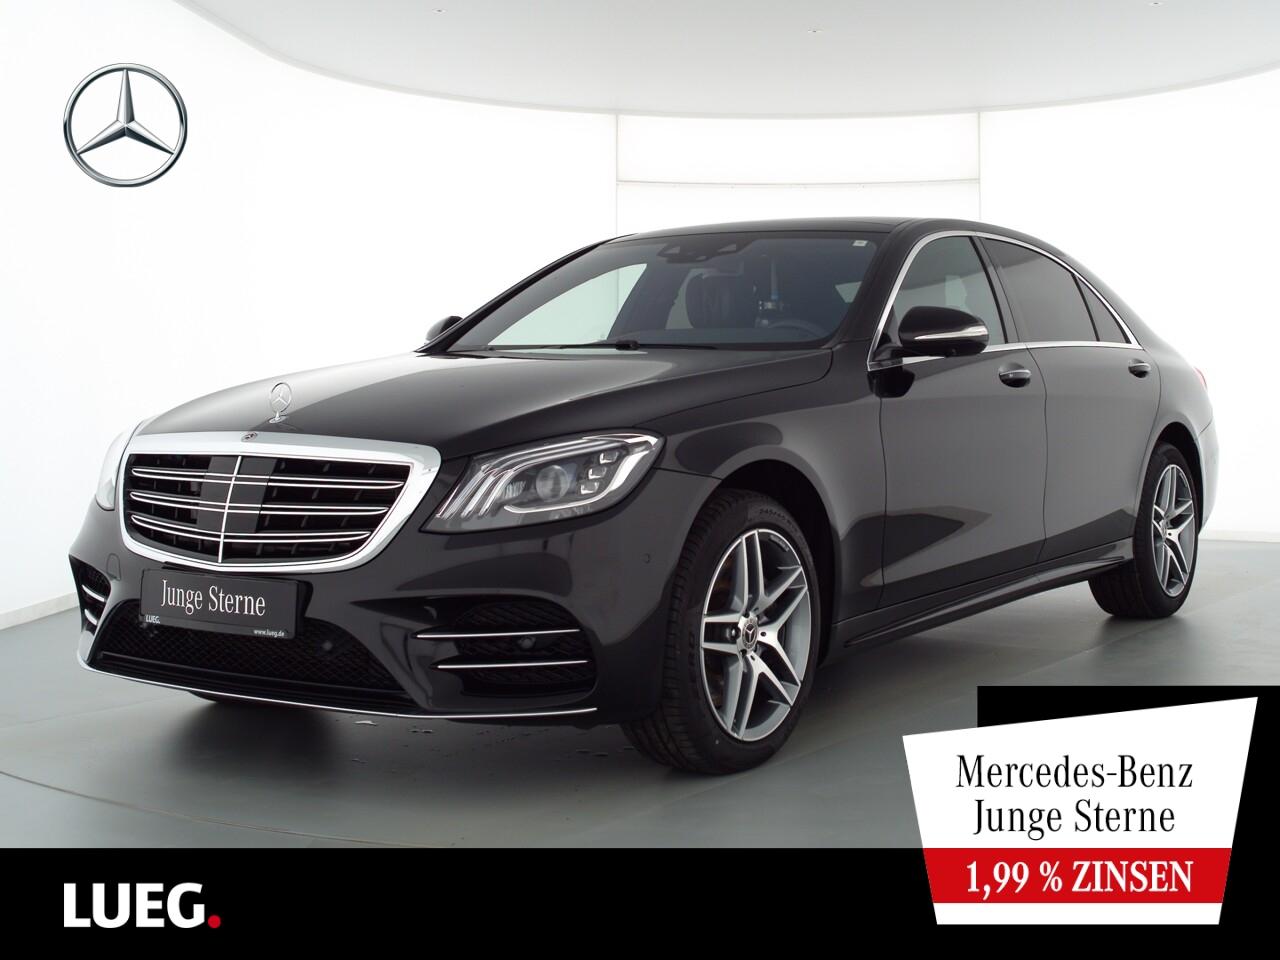 Mercedes-Benz S 450 4M L AMG+COM+Pano+Burm+Mbeam+Chauffeur+360, Jahr 2020, Benzin